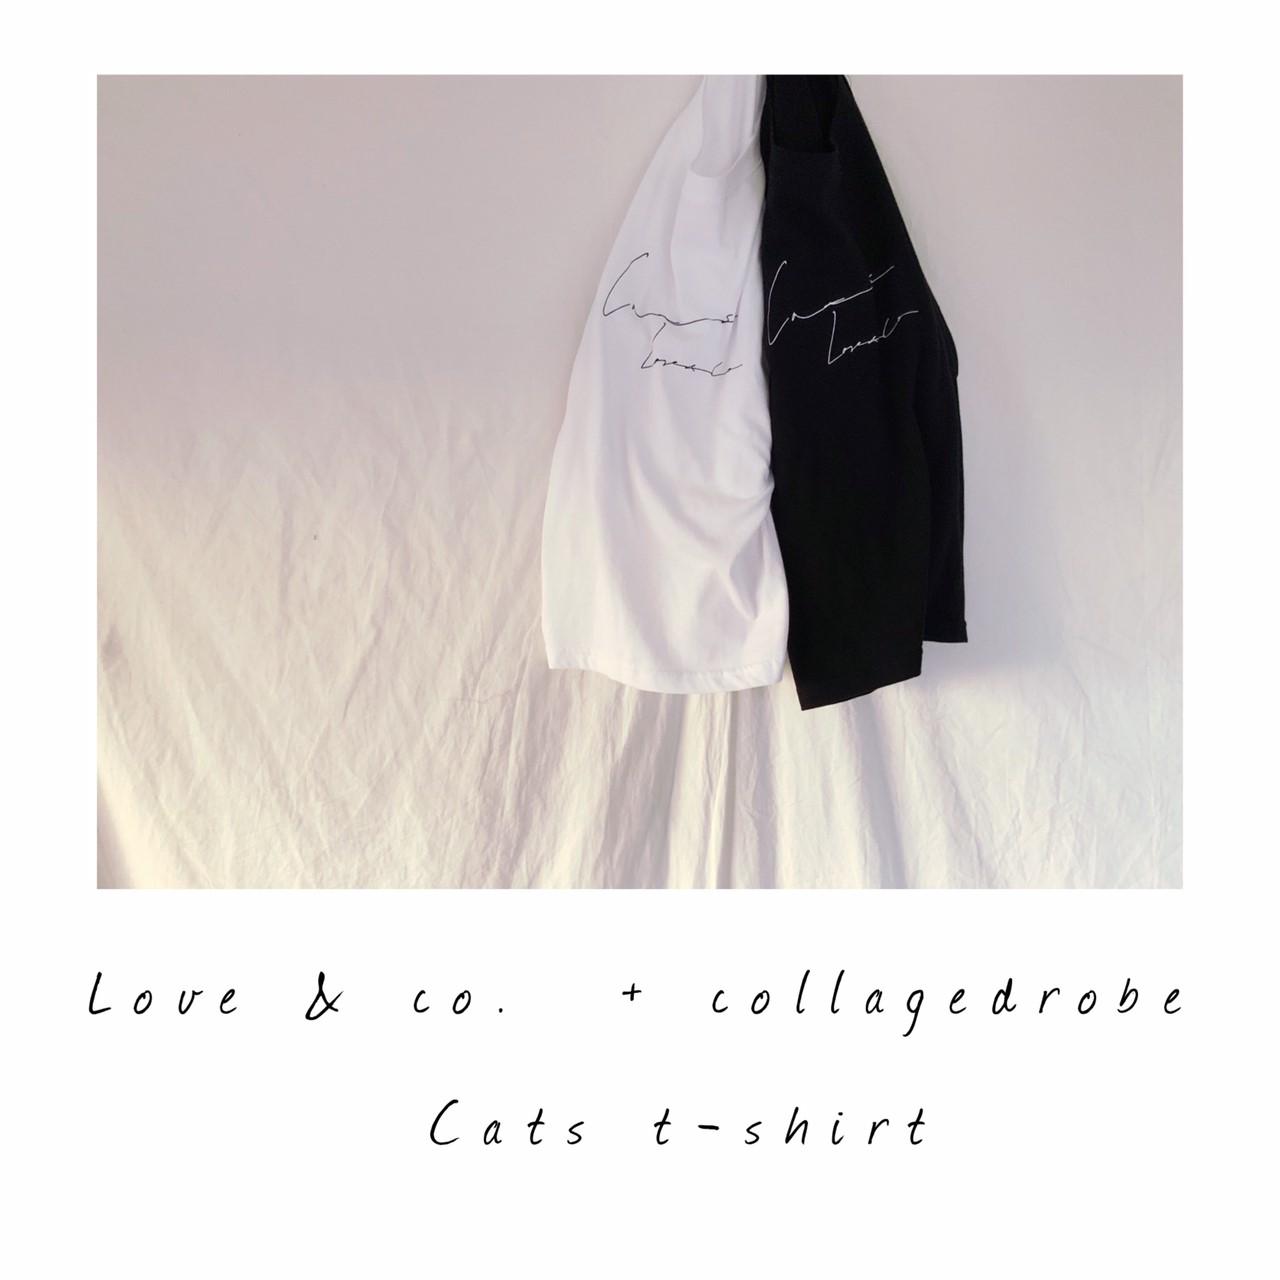 Cats ロンT by collagedrobe画像